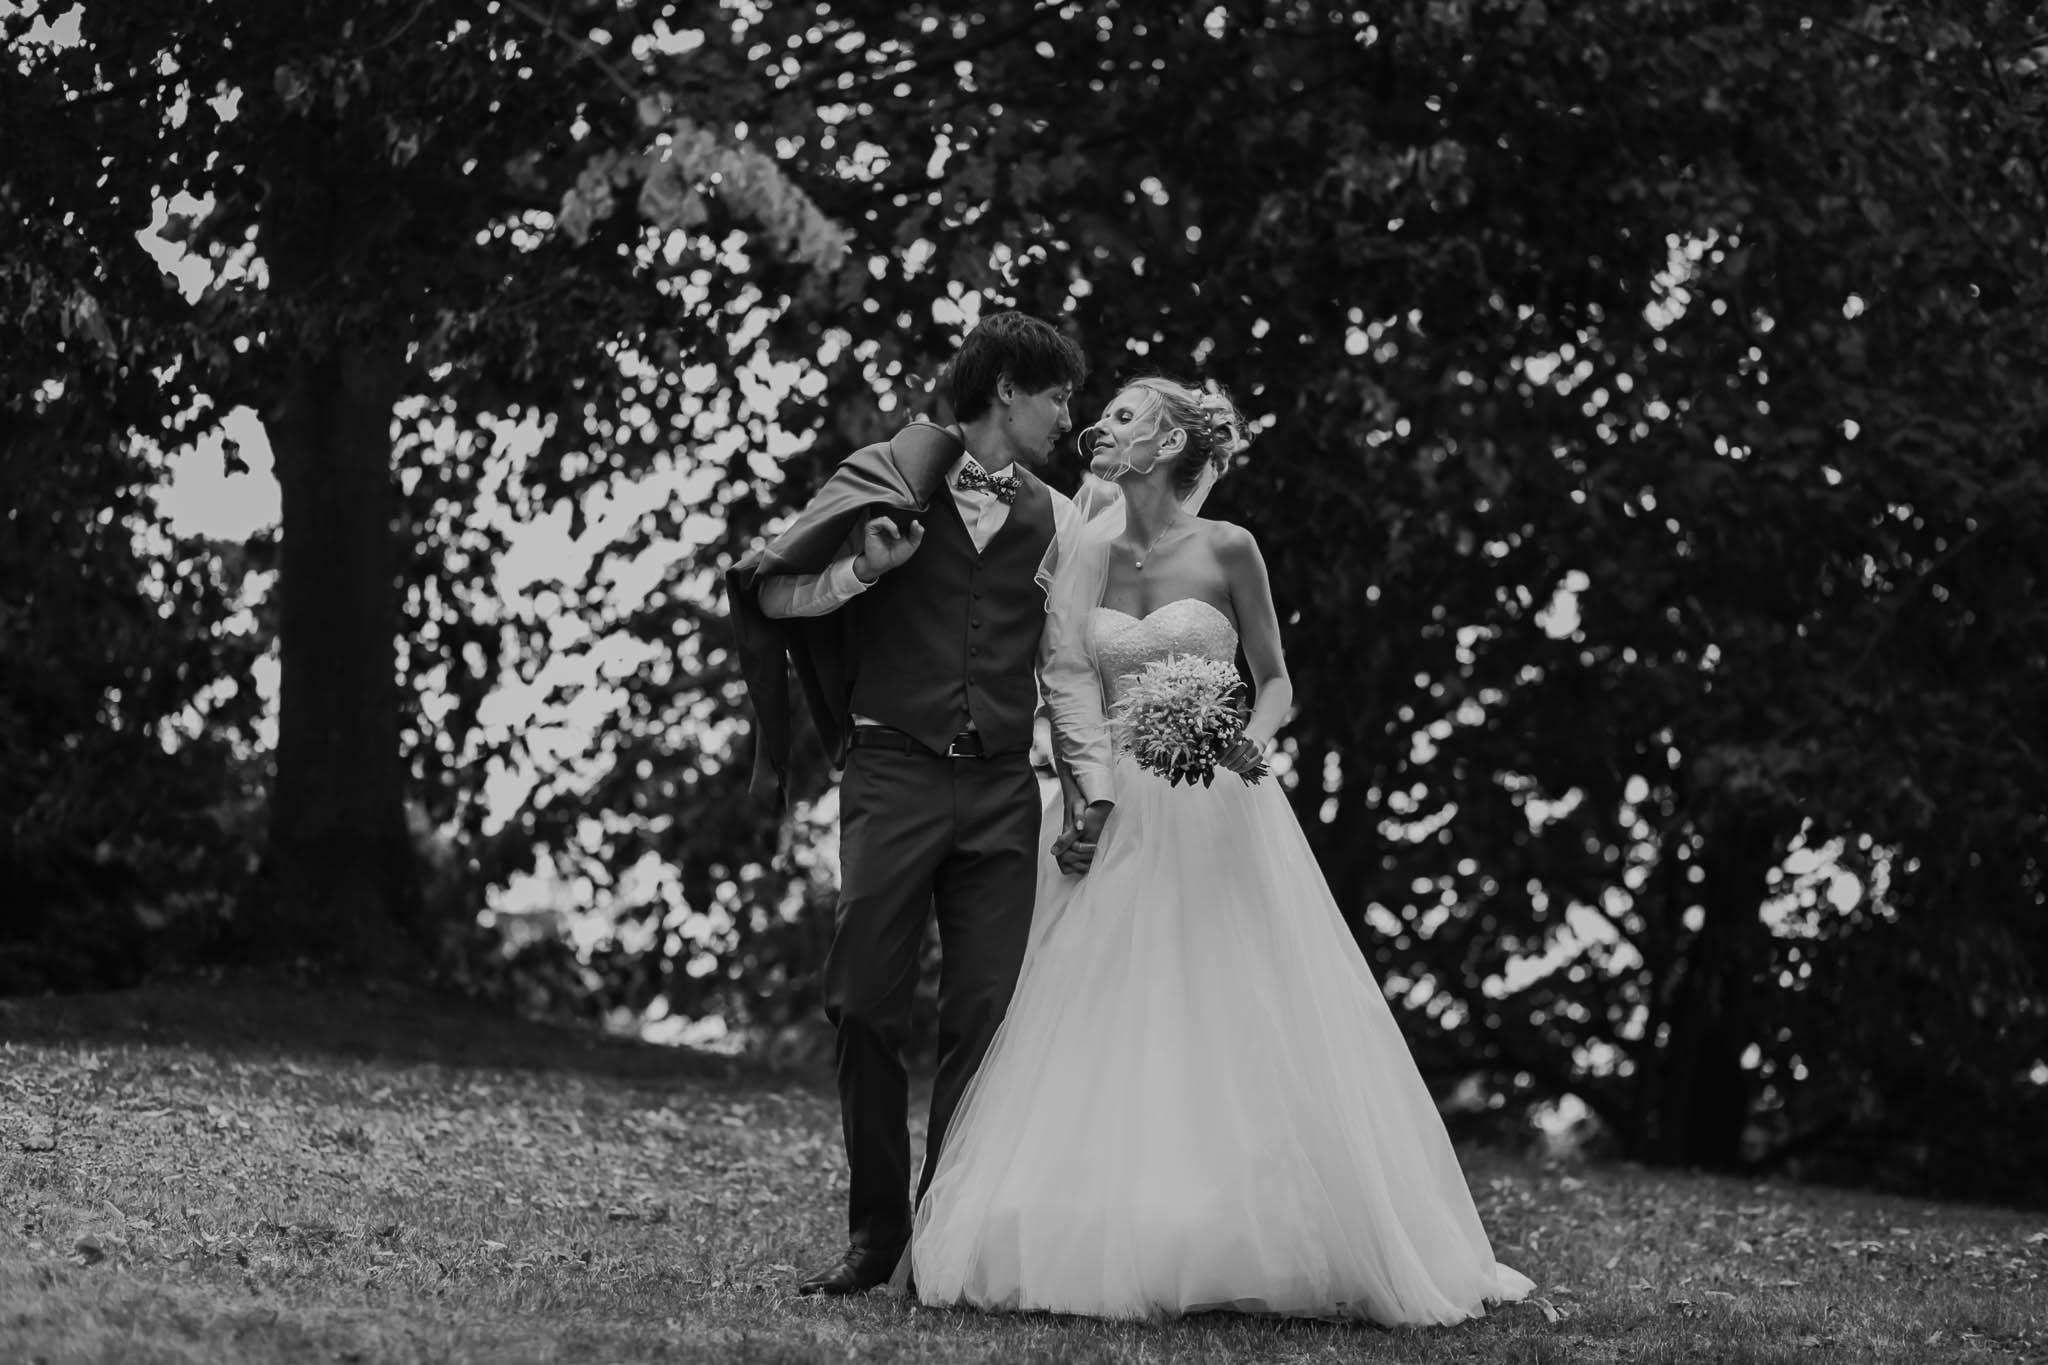 mariage-chateau-gaudras-ingold-66.jpg